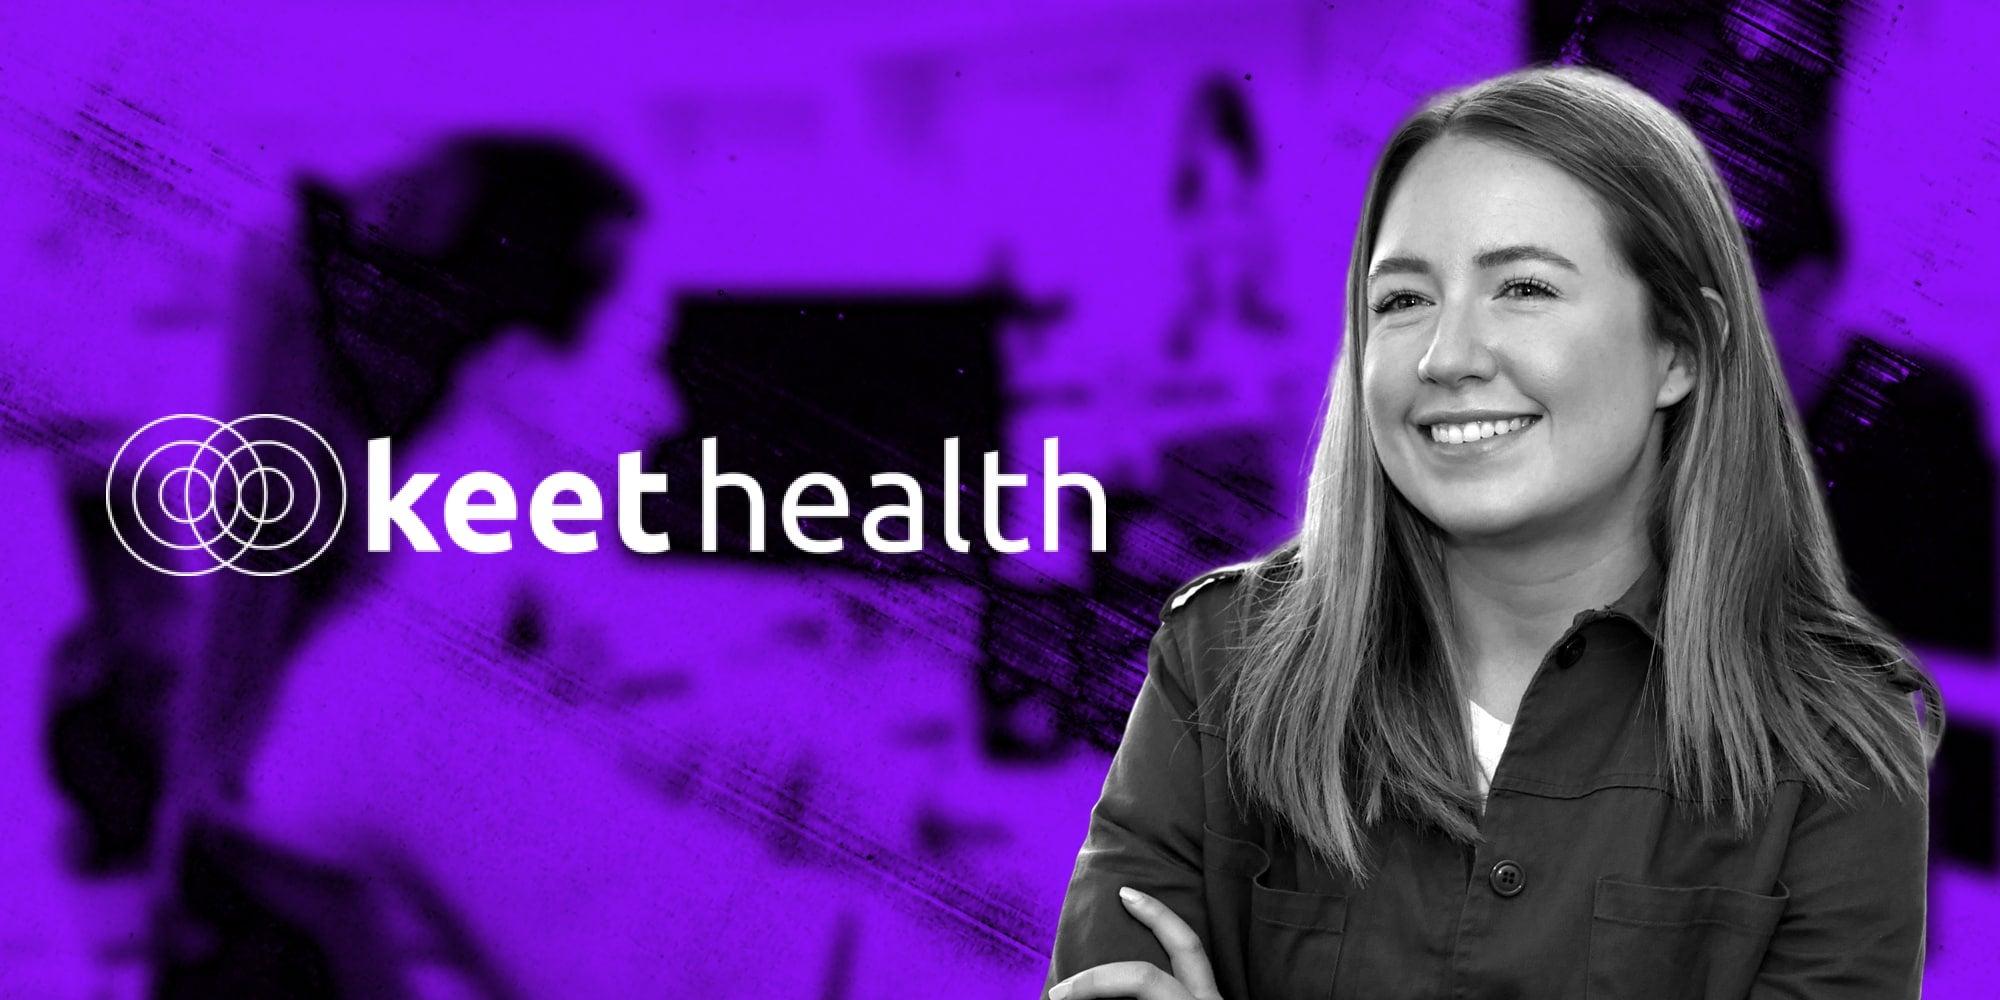 Keet Health